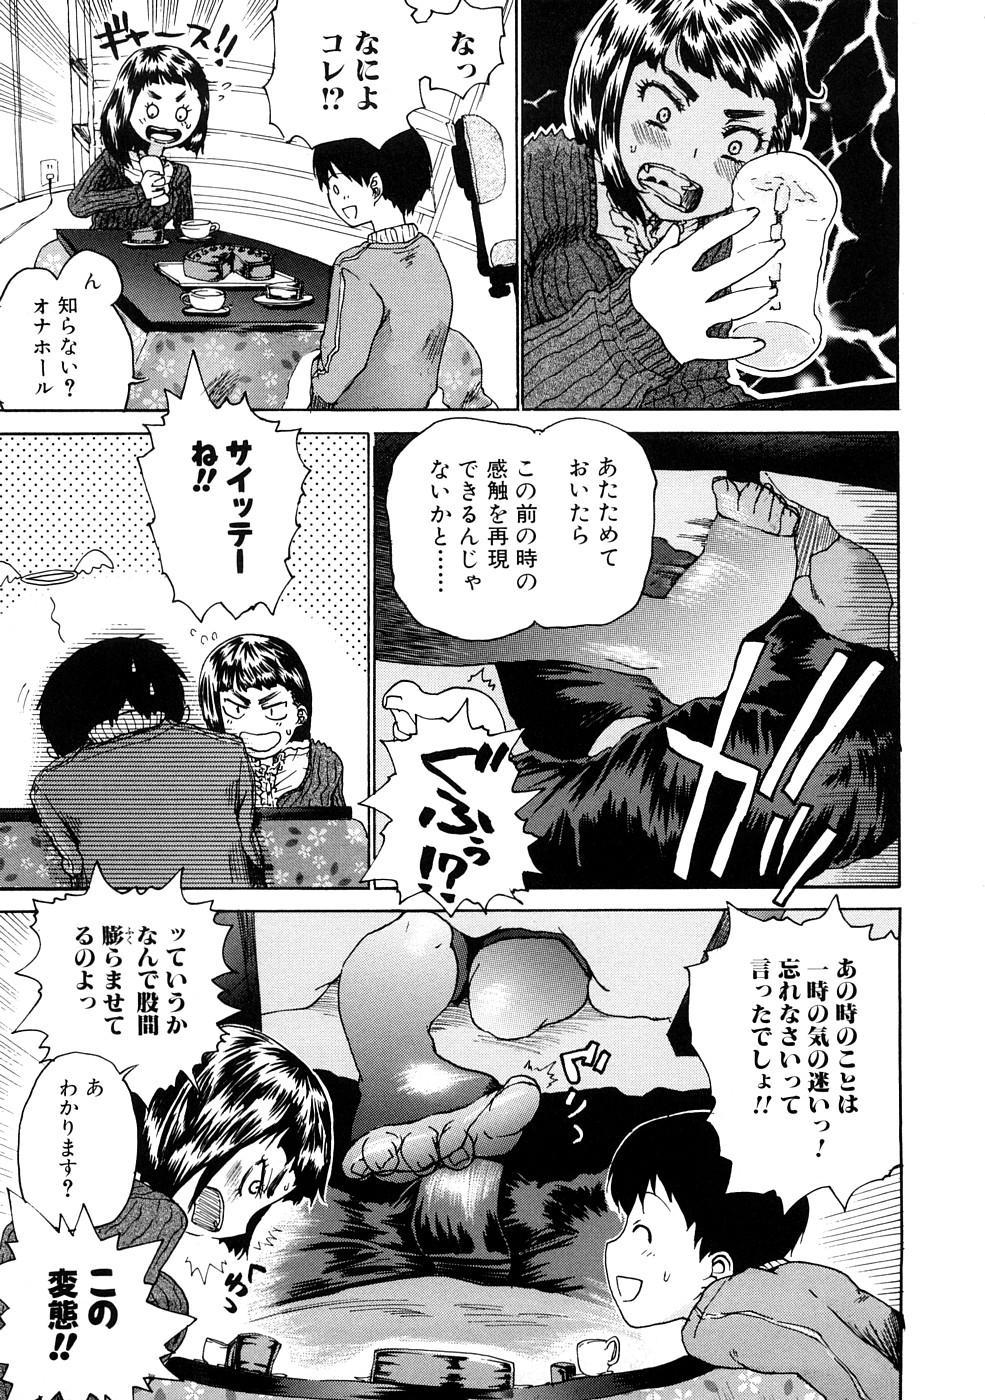 Ecchi de Jibunkatte de Kawaii Ko 100